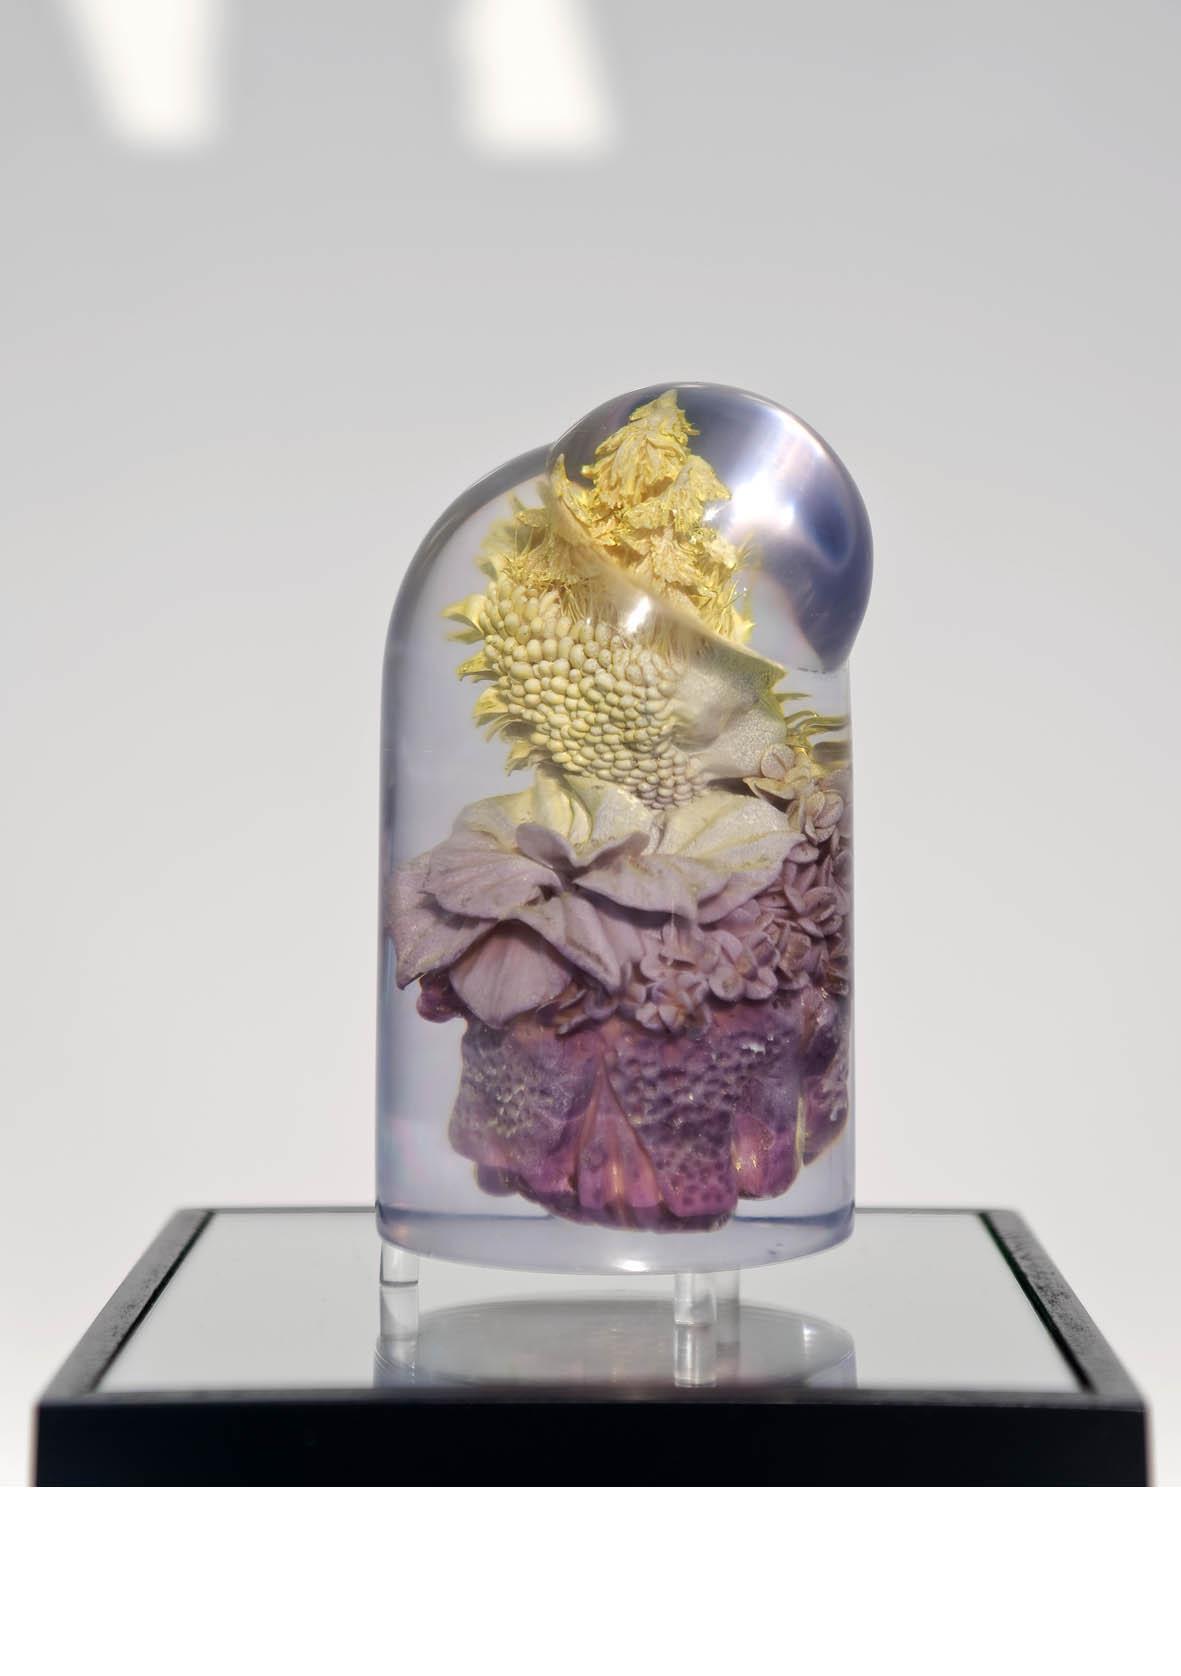 Treetop-Plopp 3, 2016, polymer, polymeric resin, color, 12x7x7cm (Foto: Andreas Baudisch/ Galerie Gerken, Berlin)